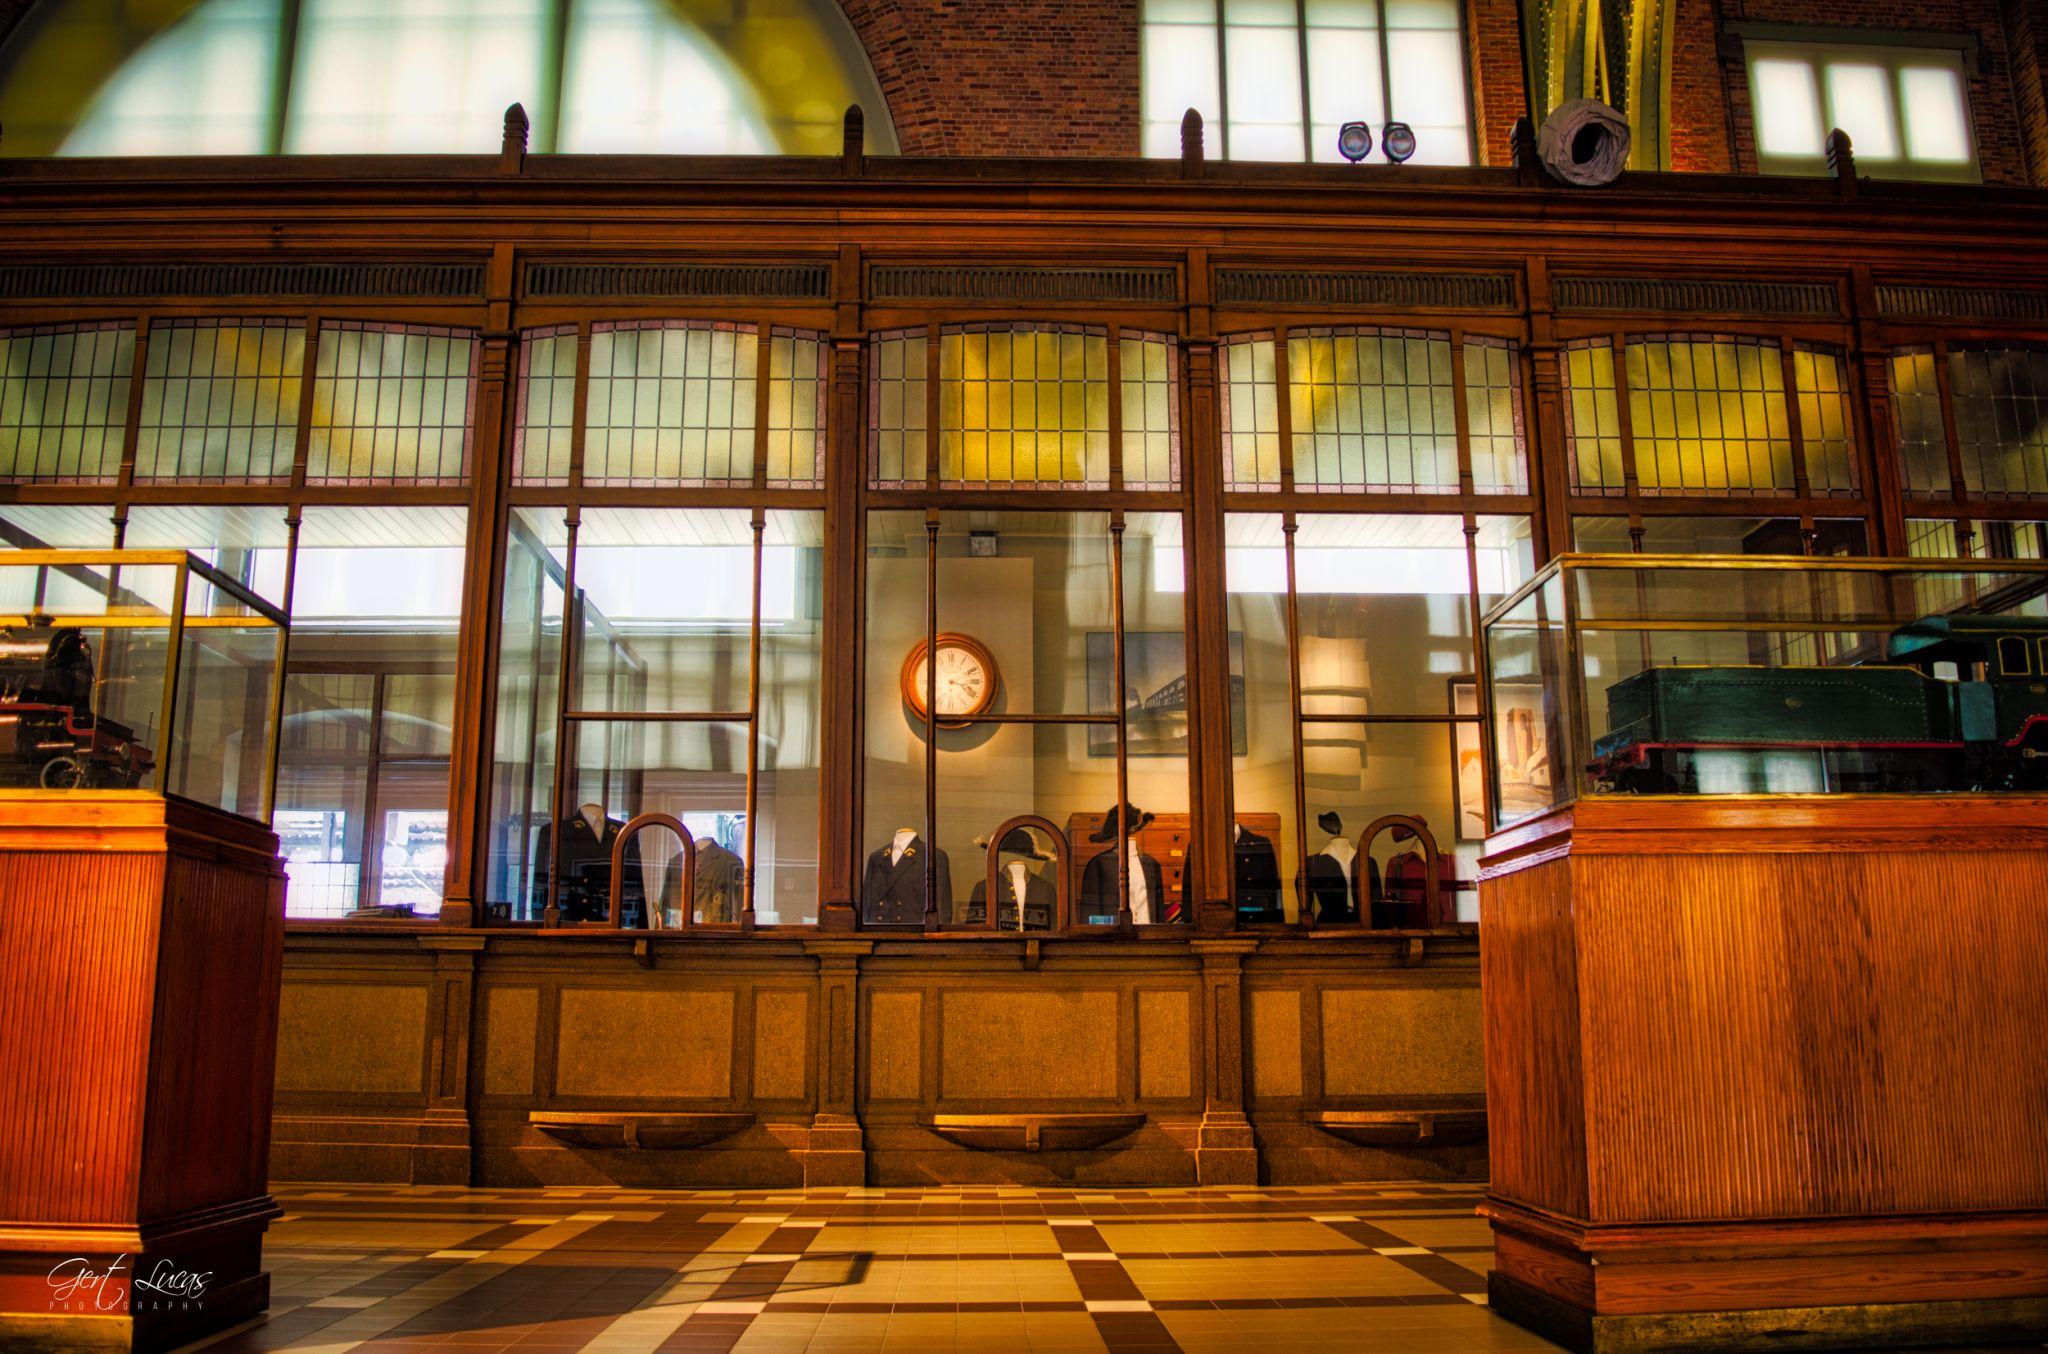 Trainworld - old counter hall, Belgium